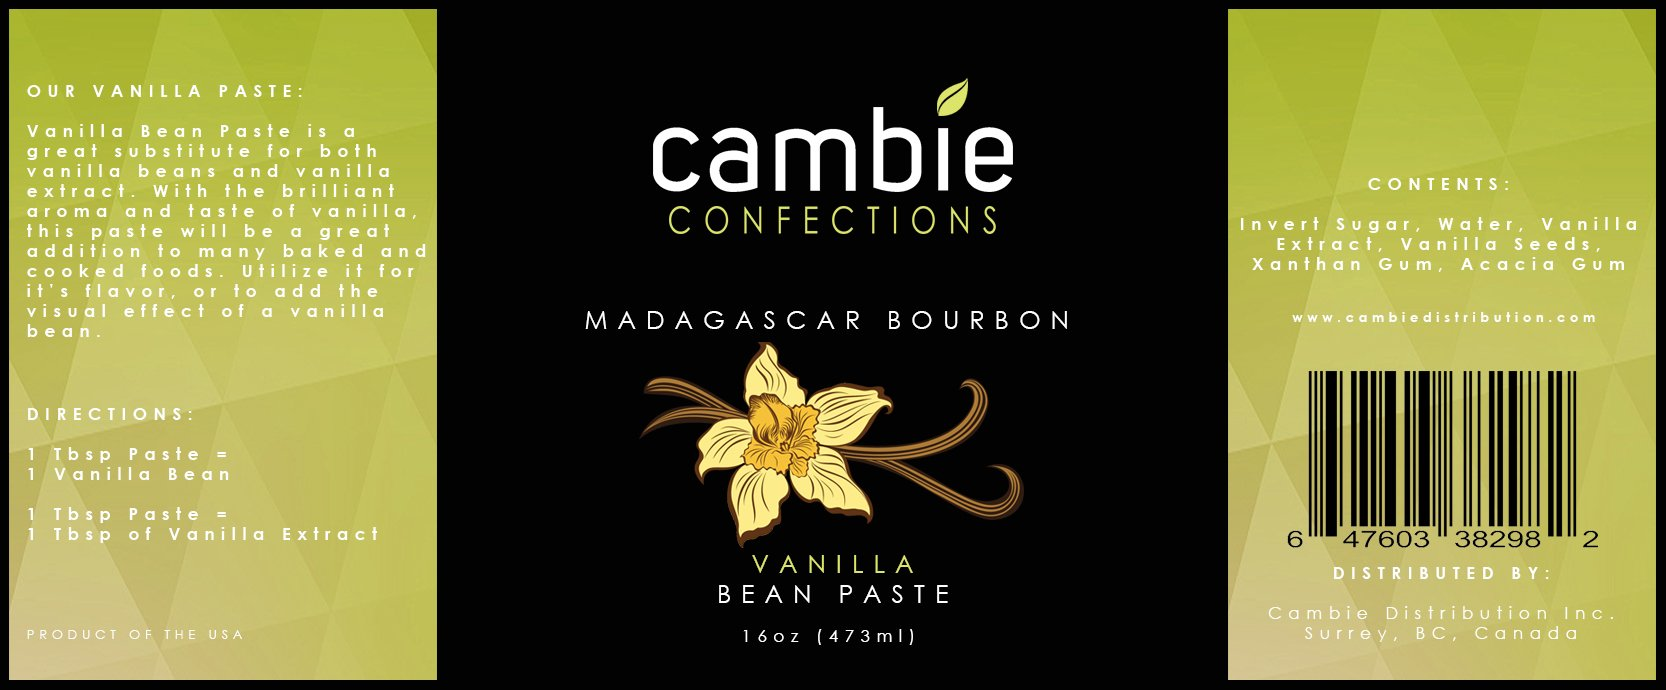 Cambie Confections Madagascar Bourbon Vanilla Bean Paste, 16 oz by Cambie Confections (Image #3)